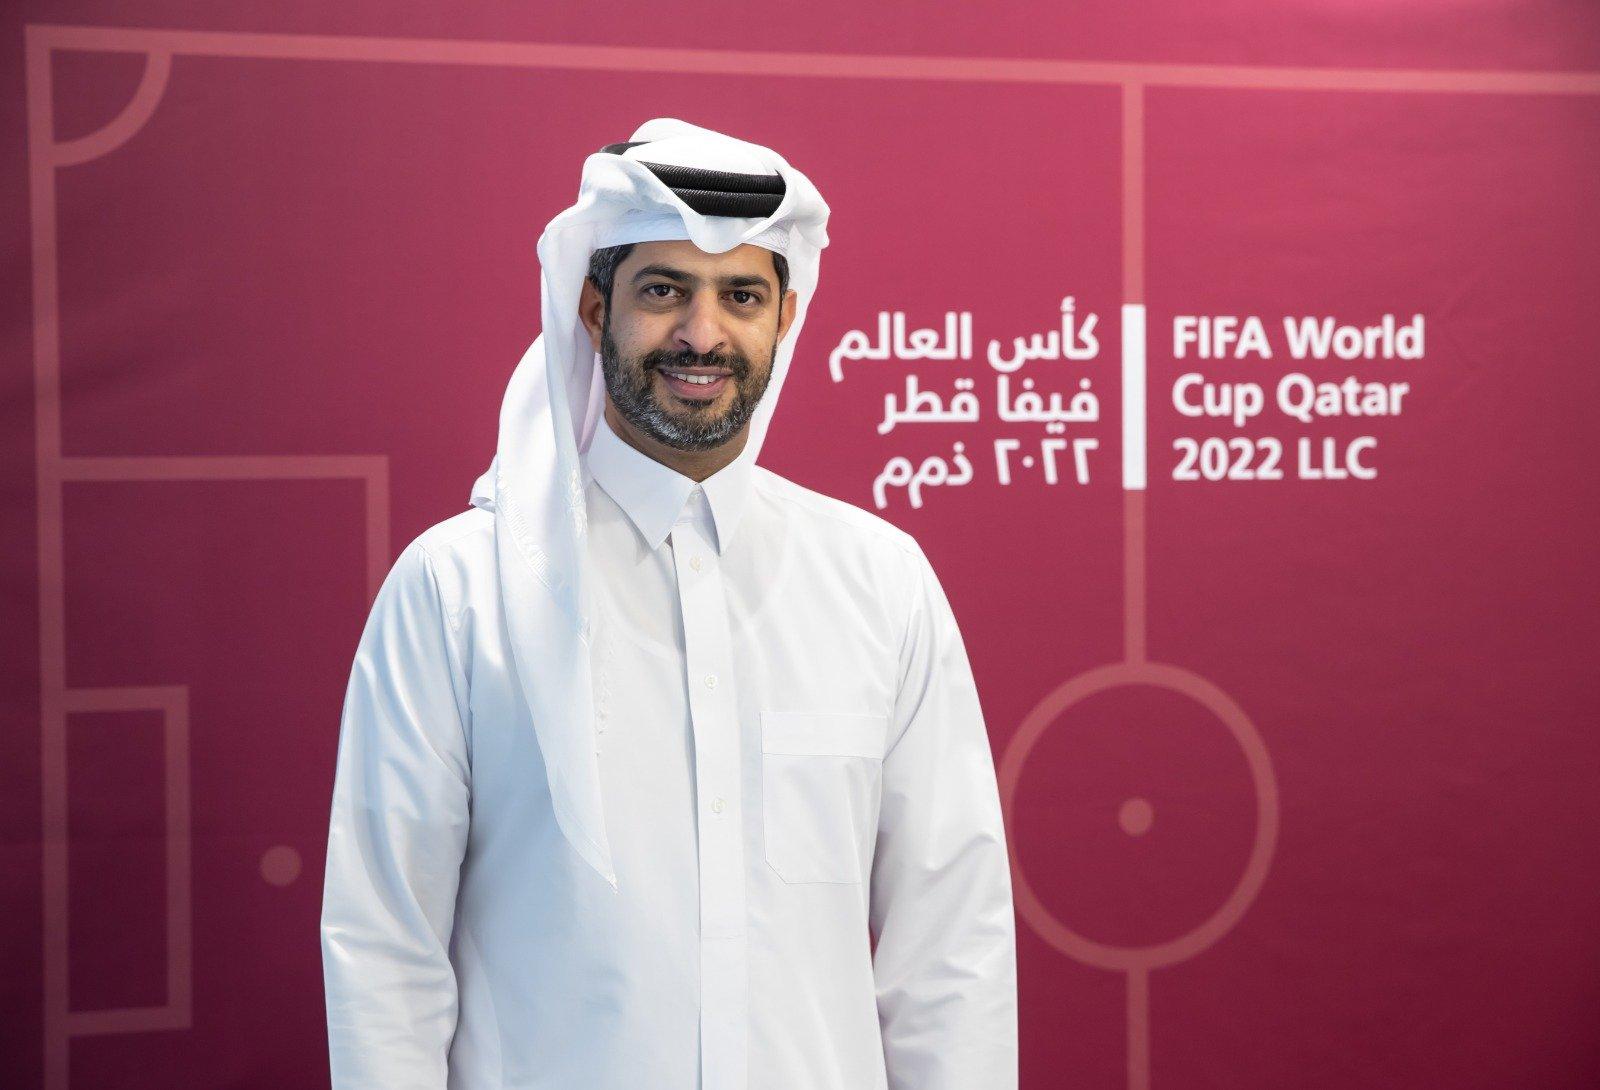 Nasser al-Khater, FIFA Dünya Kupası Katar 2022 LLC'nin CEO'su.